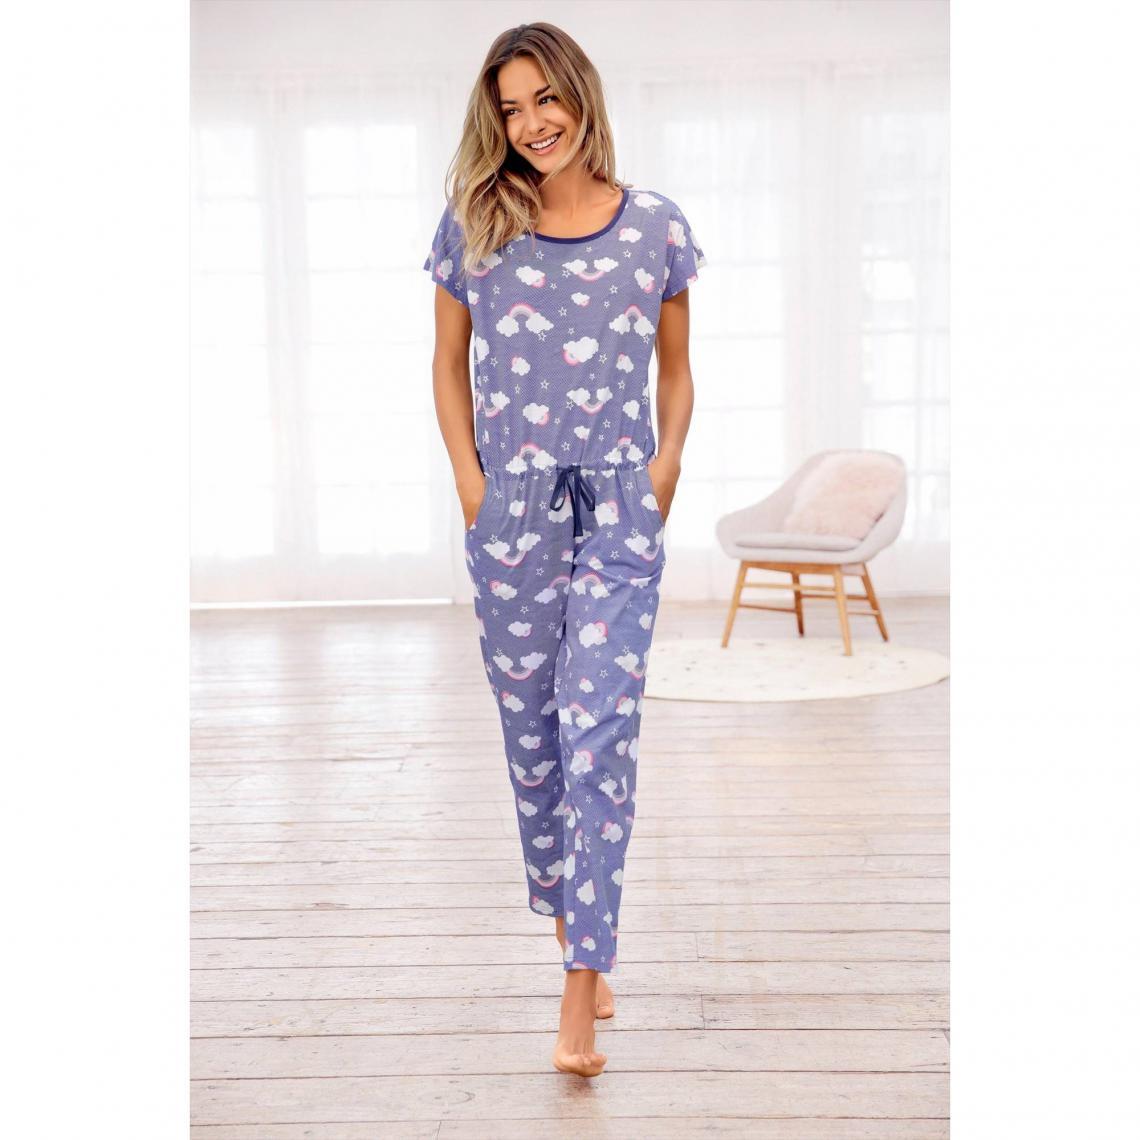 e.Femme Femme Helen Ensemble de Pyjama en 100/% Coton